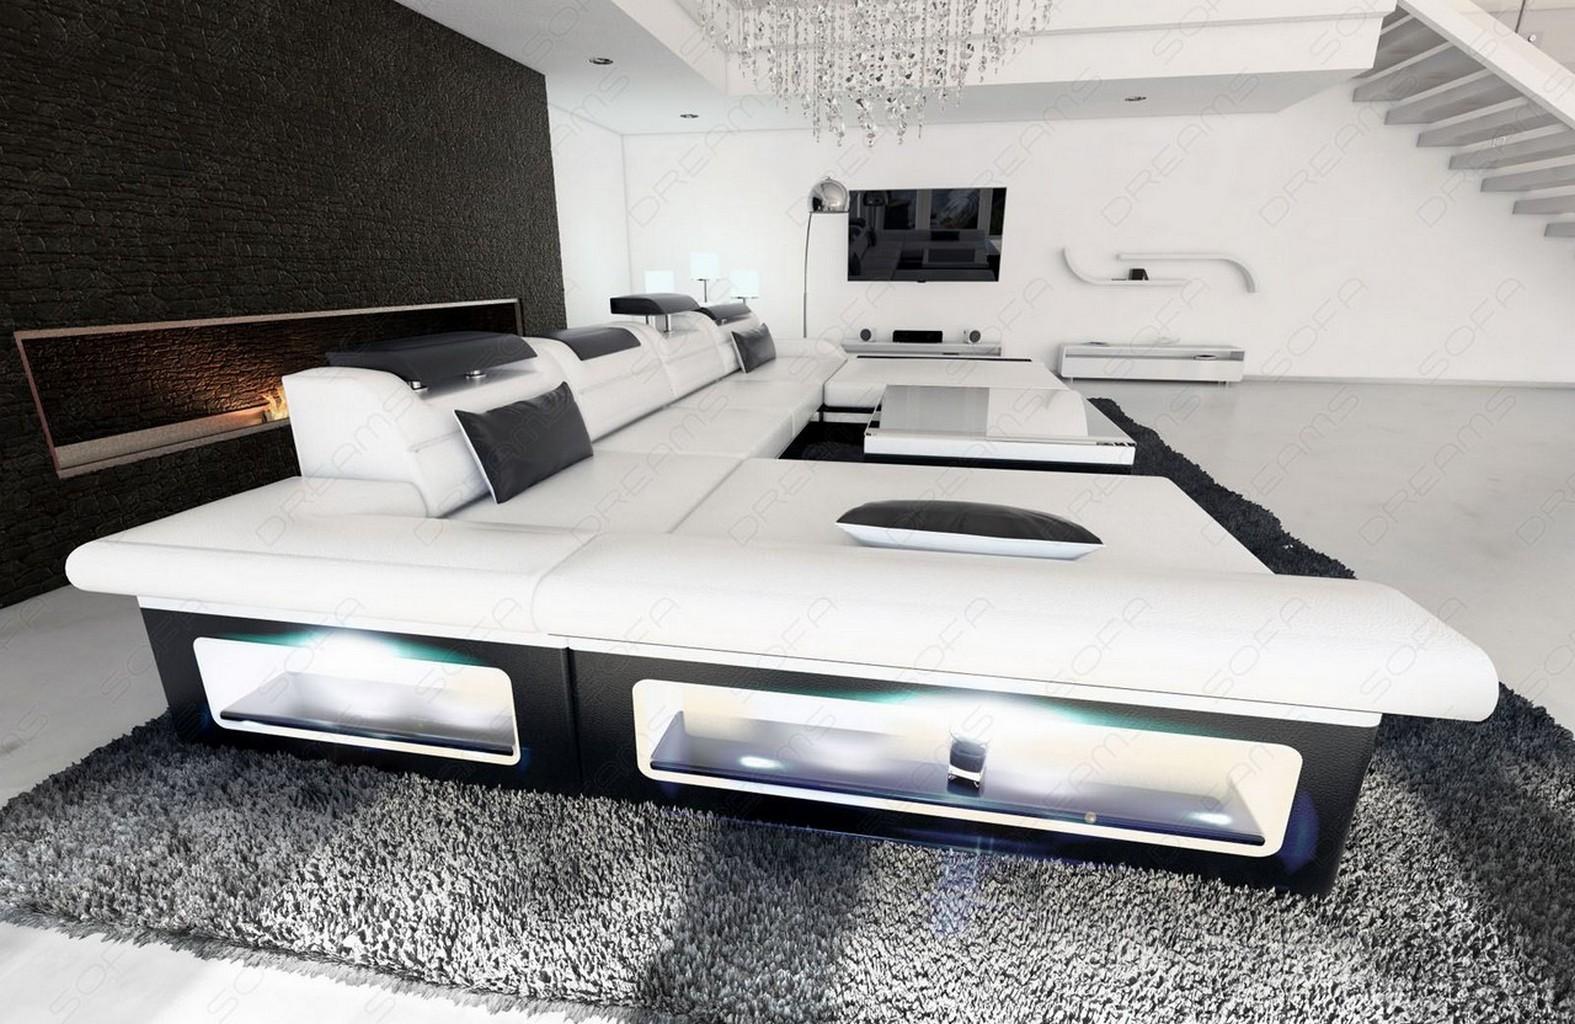 designersofa monza xxl with led lighting bigsofa white black ebay. Black Bedroom Furniture Sets. Home Design Ideas